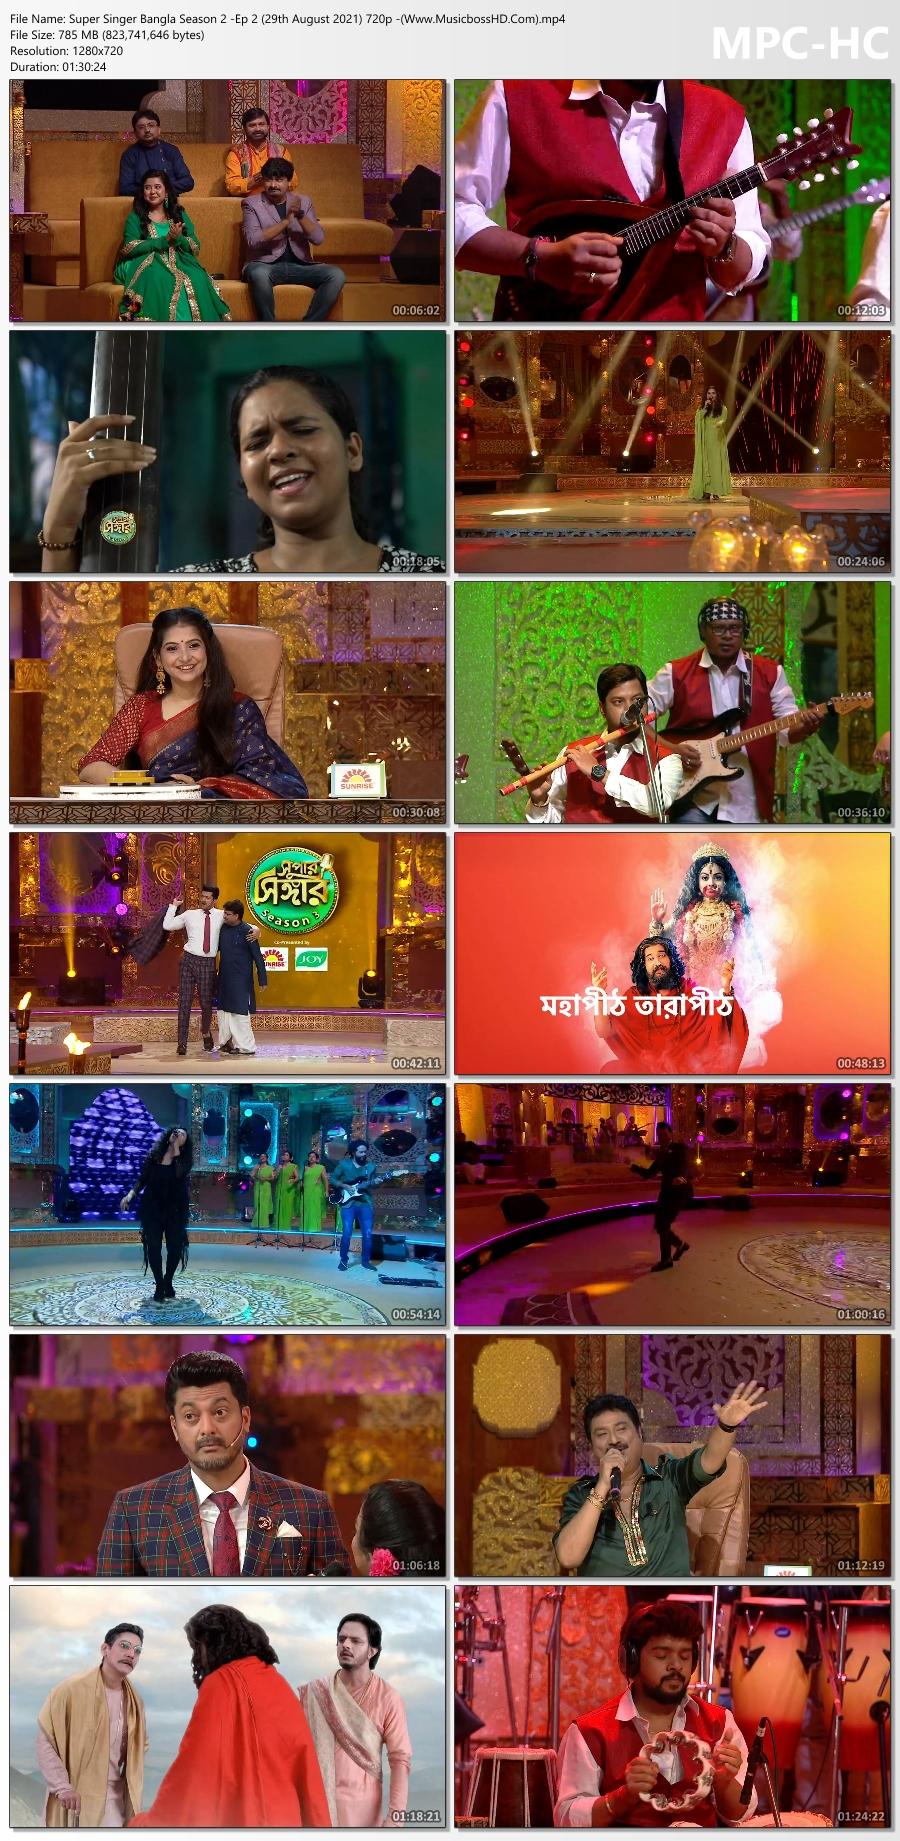 Super-Singer-Bangla-Season-2-Ep-2-29th-August-2021-720p-Www-Musicboss-HD-Com-mp4-thumbs